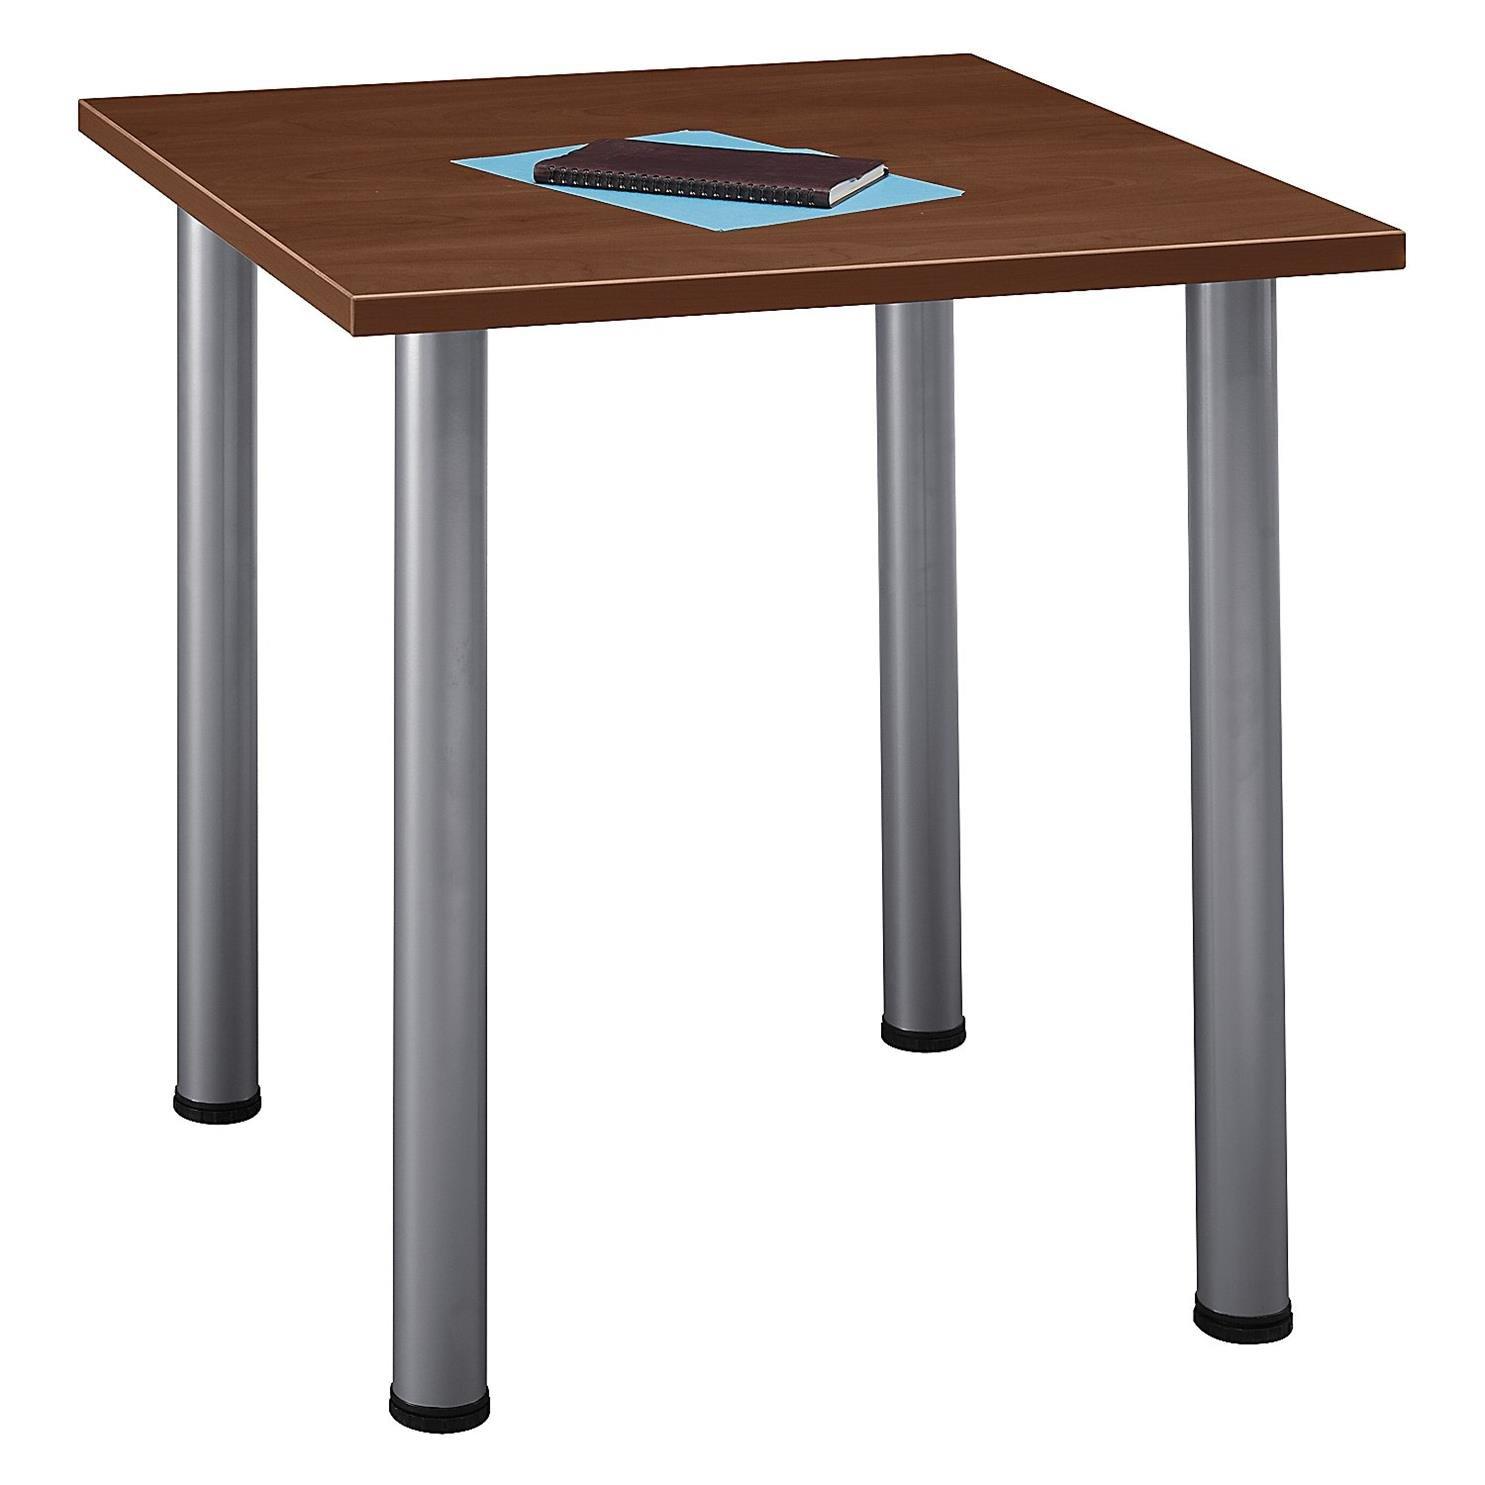 Square table furniture - Square Table Furniture